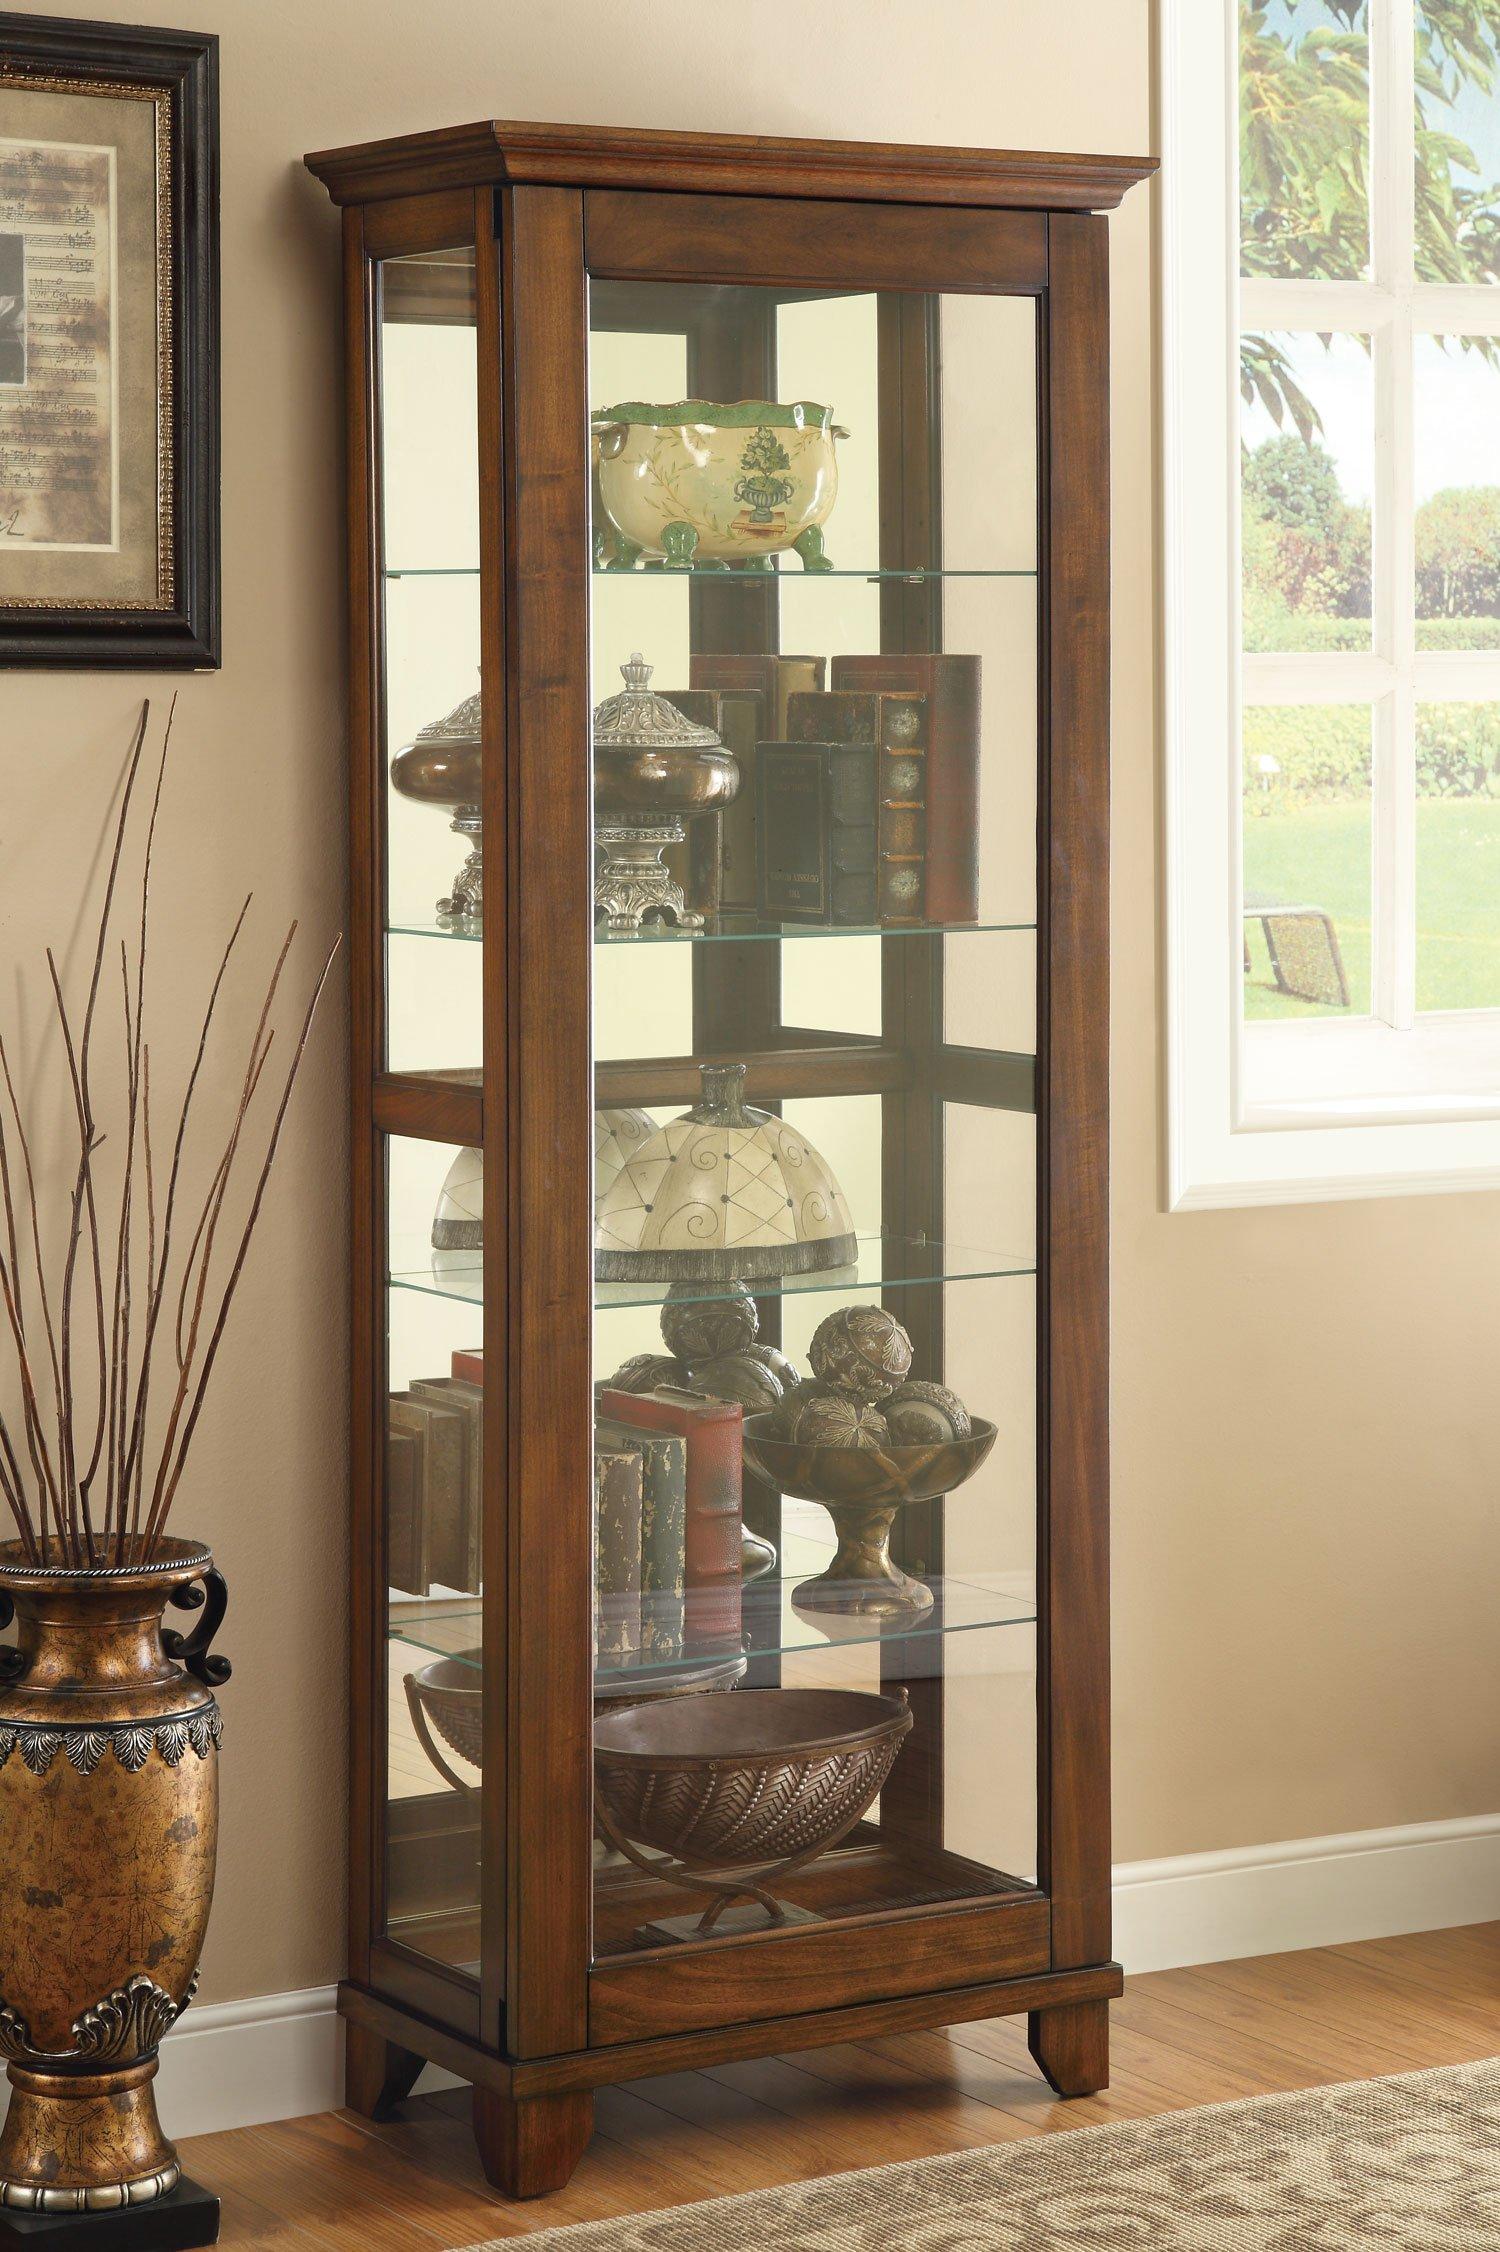 Coaster Home Furnishings Casual Curio Cabinet, Warm Brown